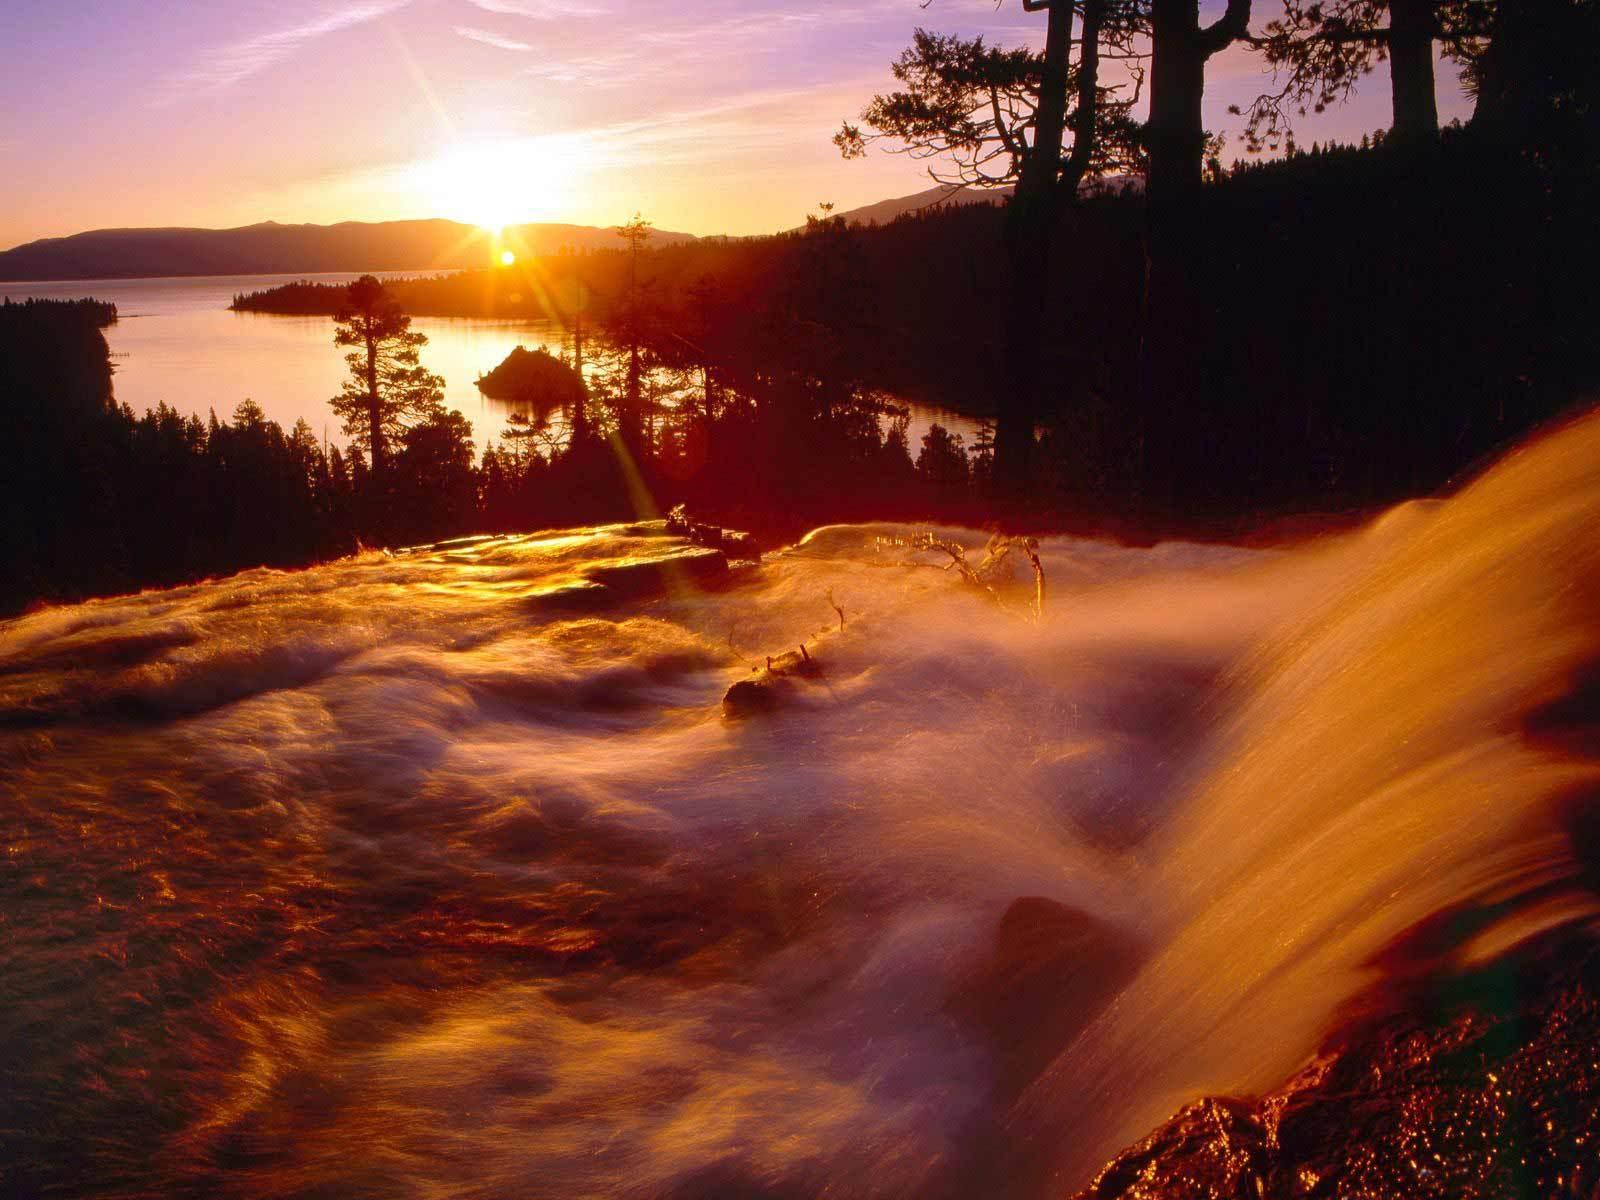 Lake Tahoe In California Beautiful Pictures Photo